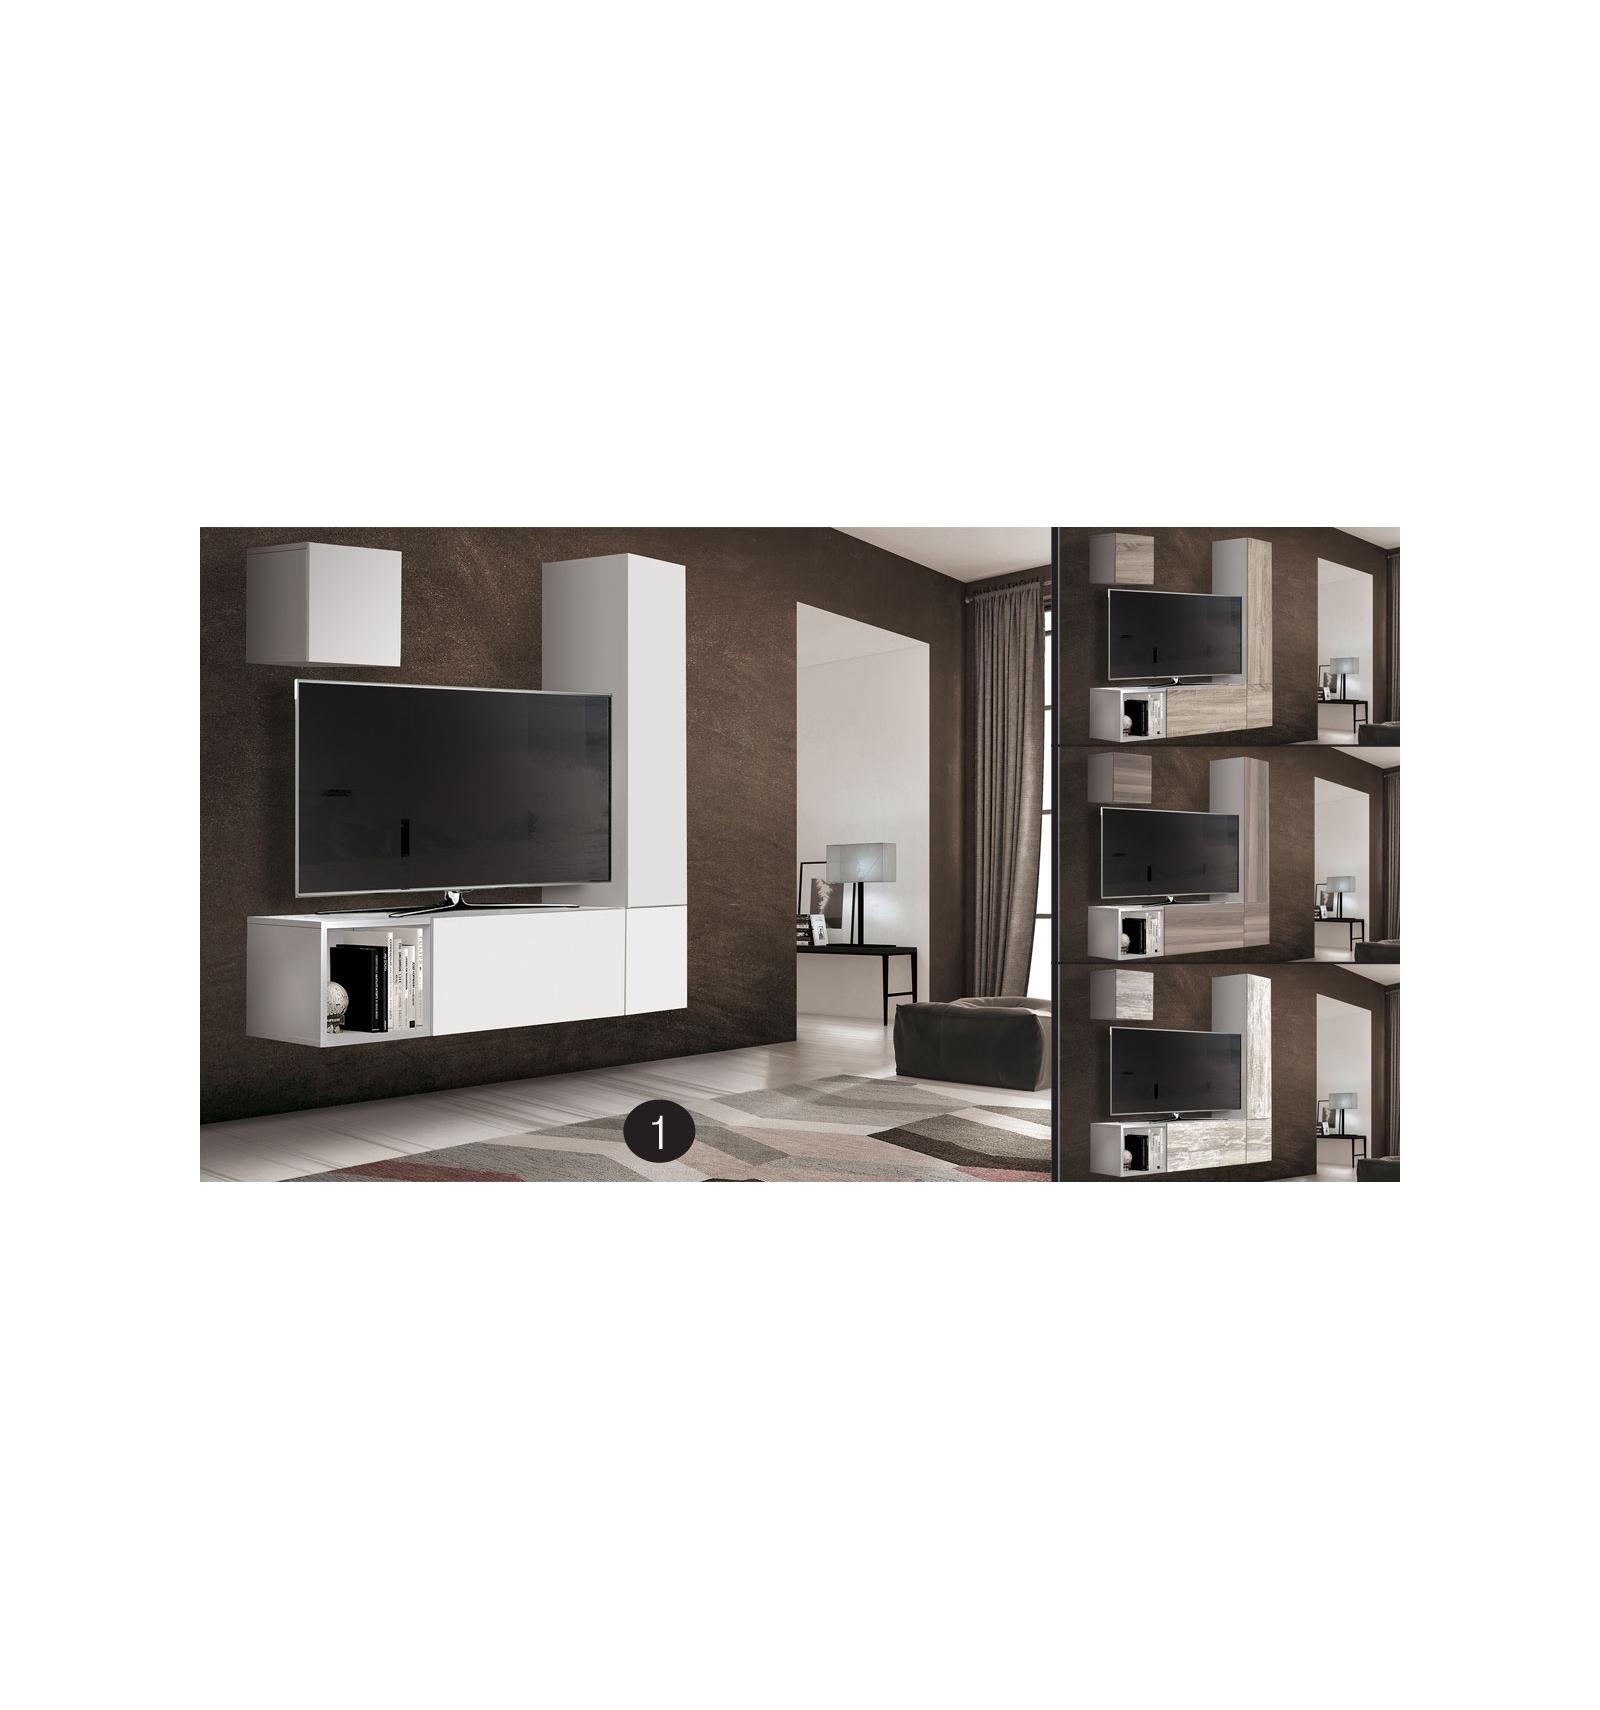 Mueble modular de sal n twist for Mueble modular salon